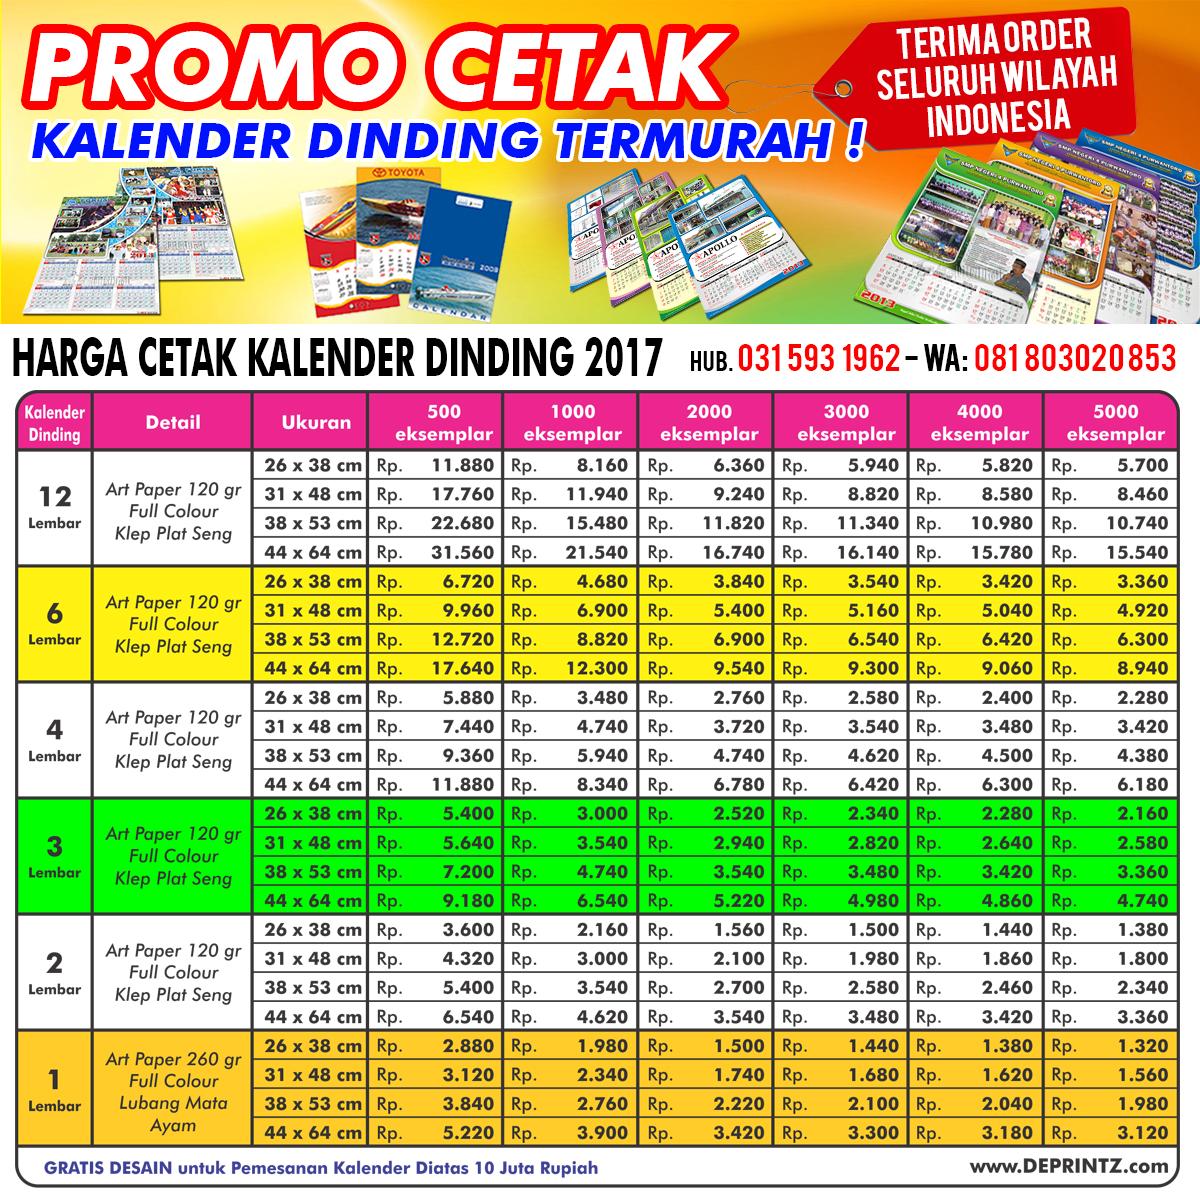 jasa percetakan kalender dinding 2017 murah 1 2 3 4 6 12 bulan